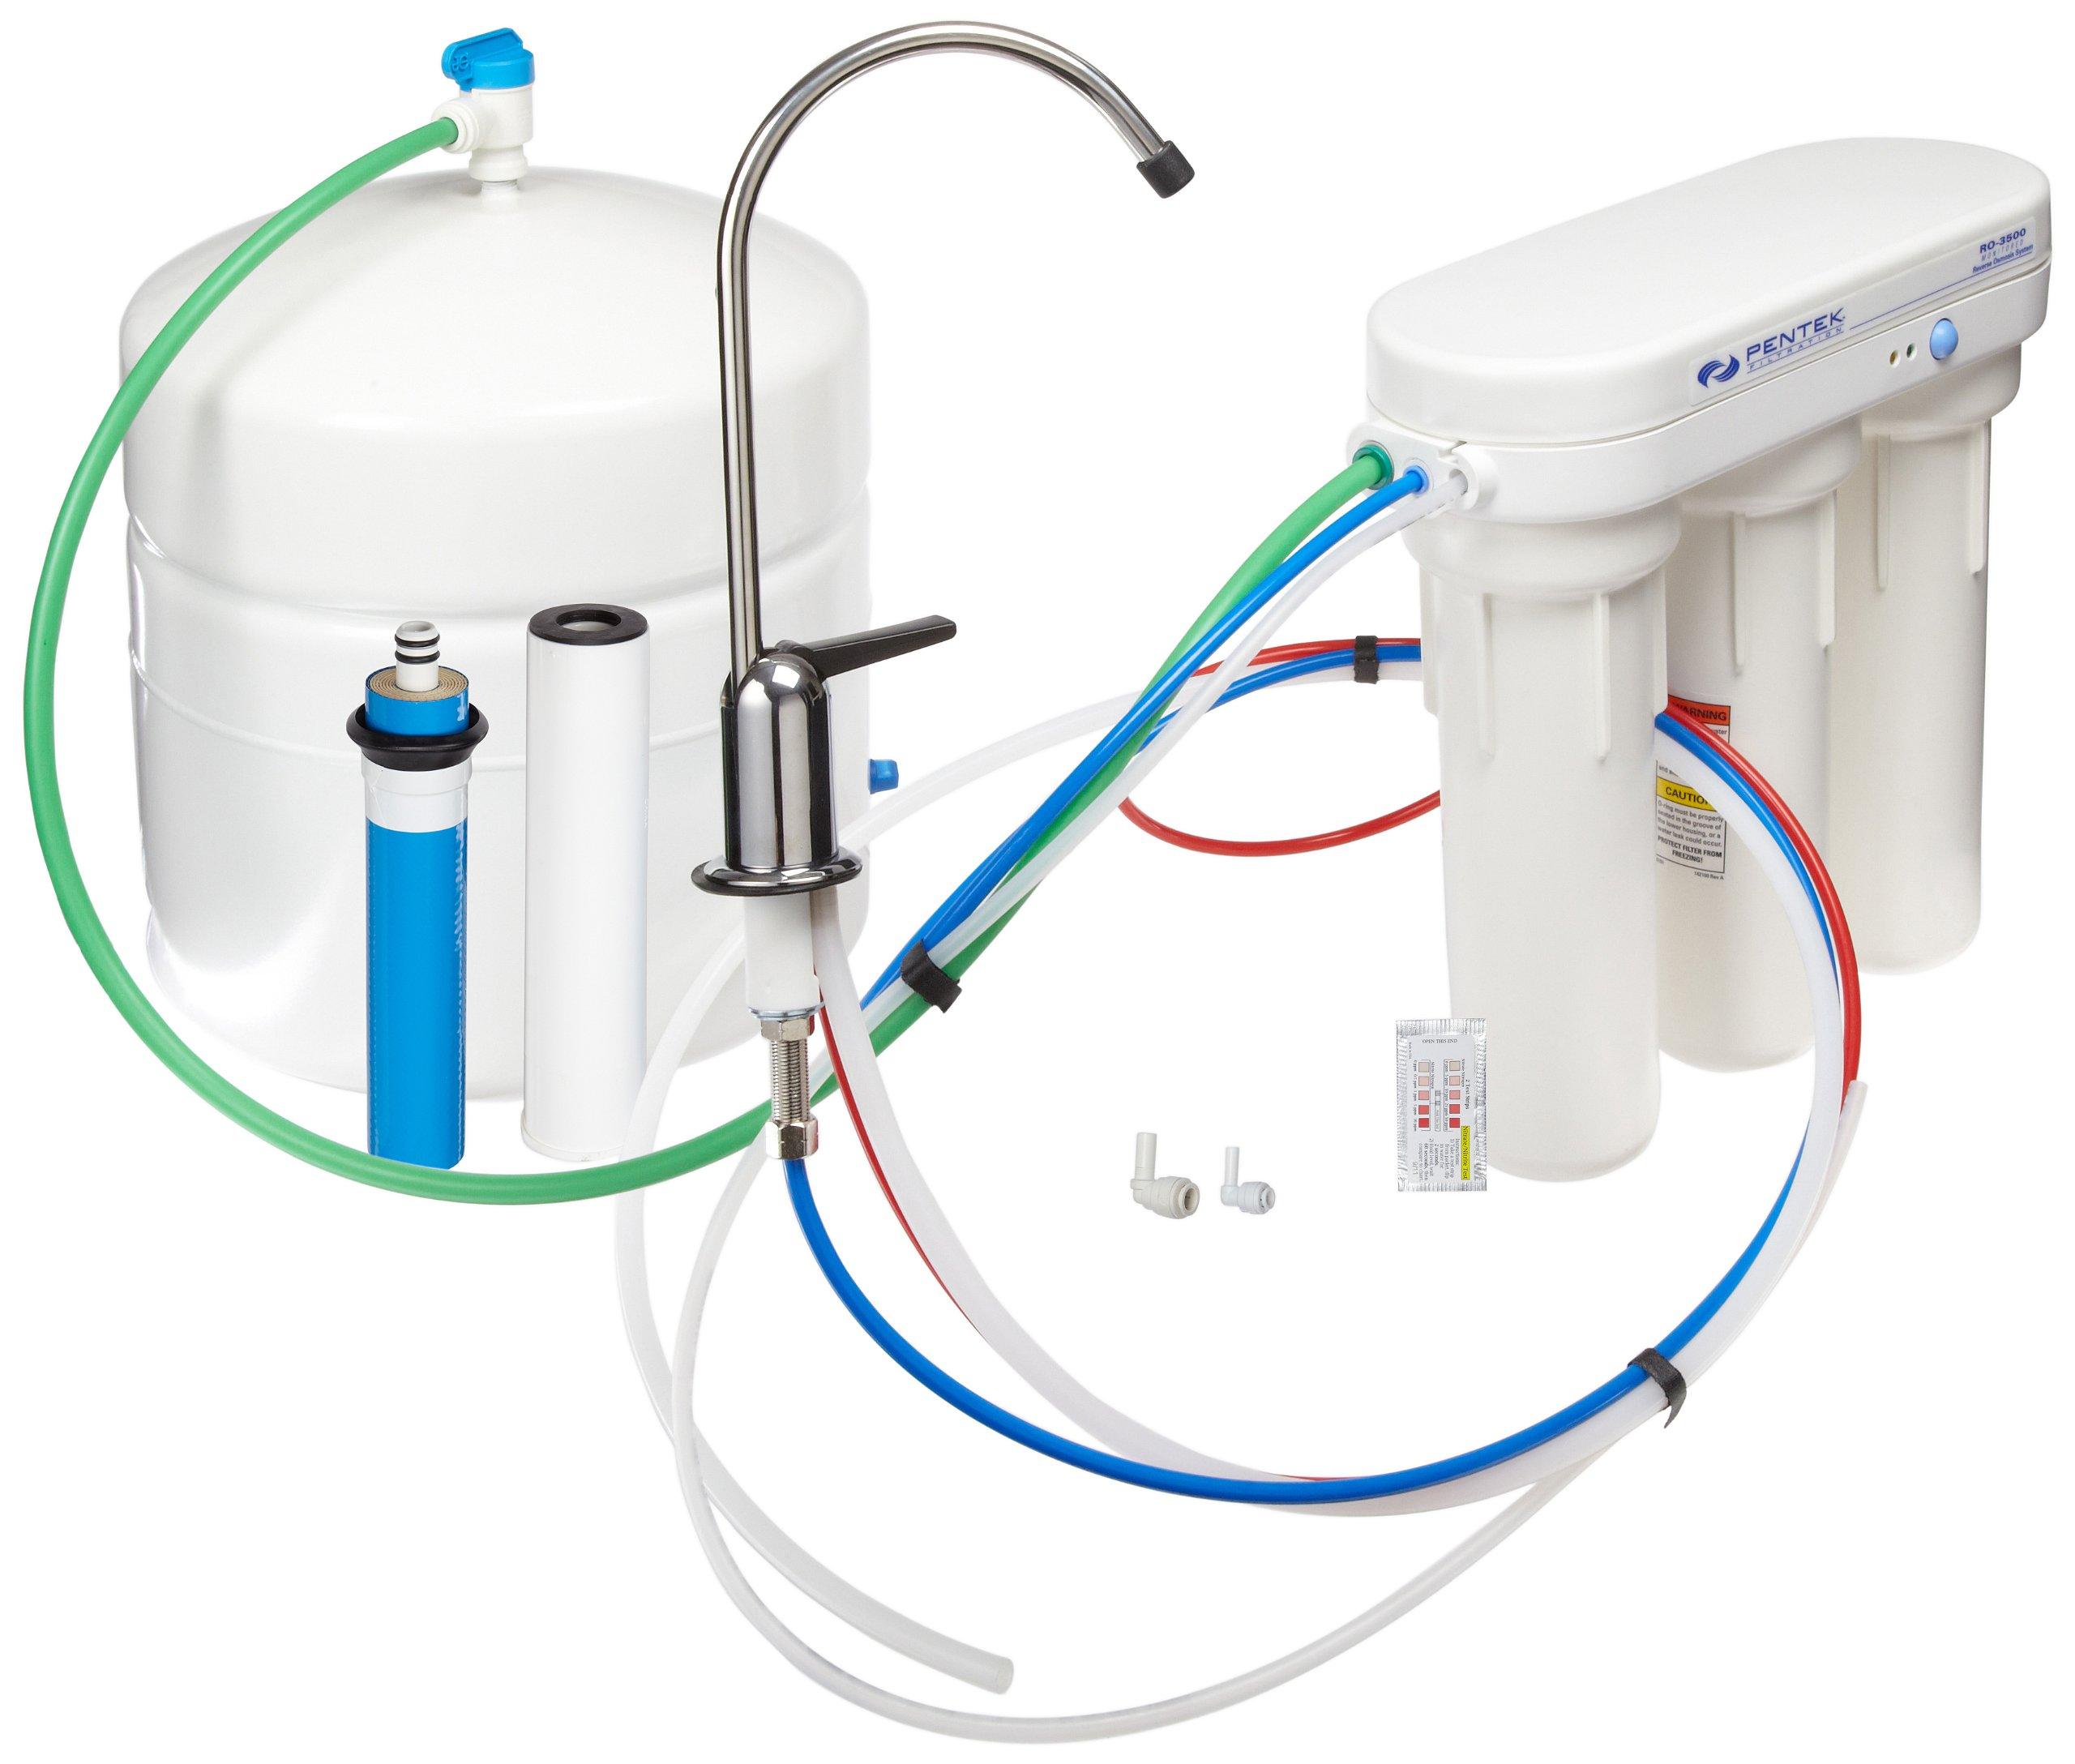 Pentek 161013 RO-3500 Reverse Osmosis System